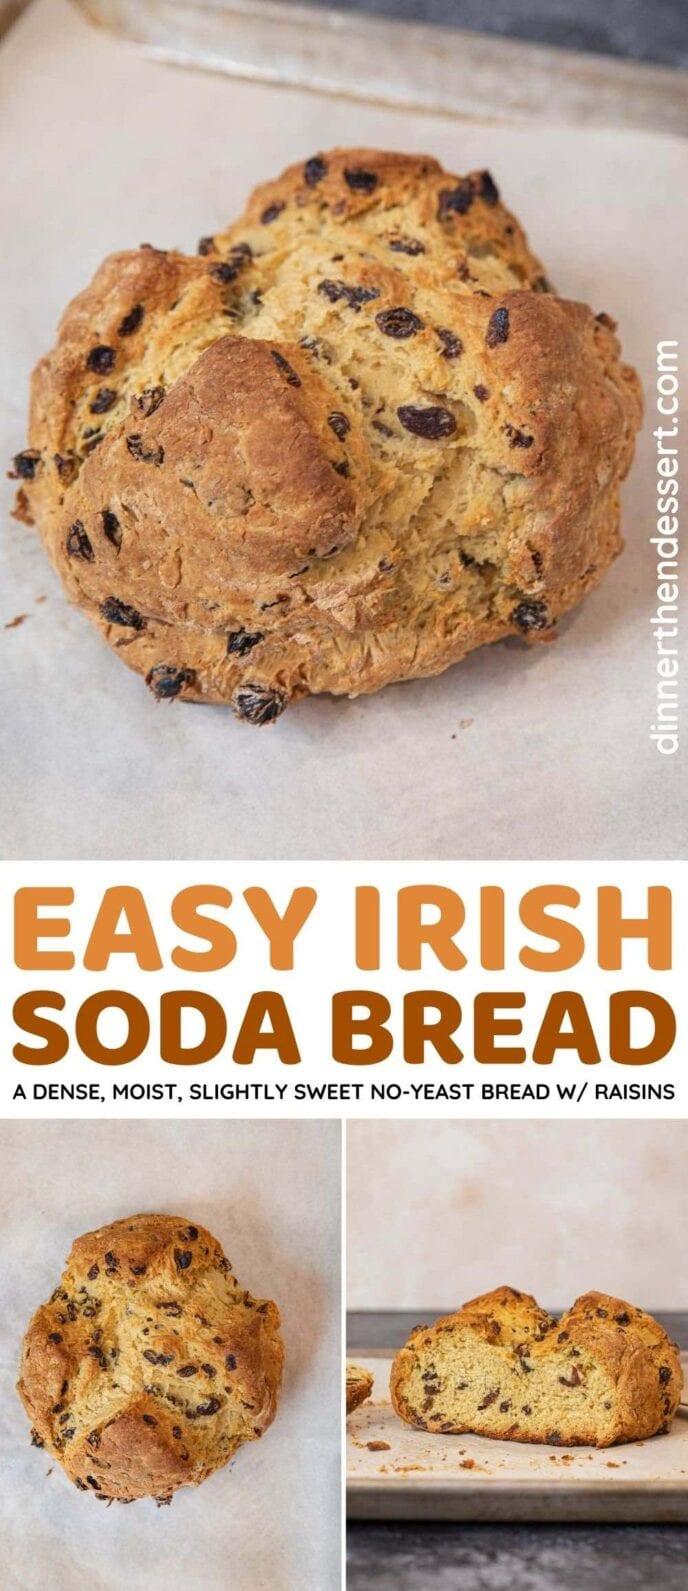 Irish Soda Bread collage